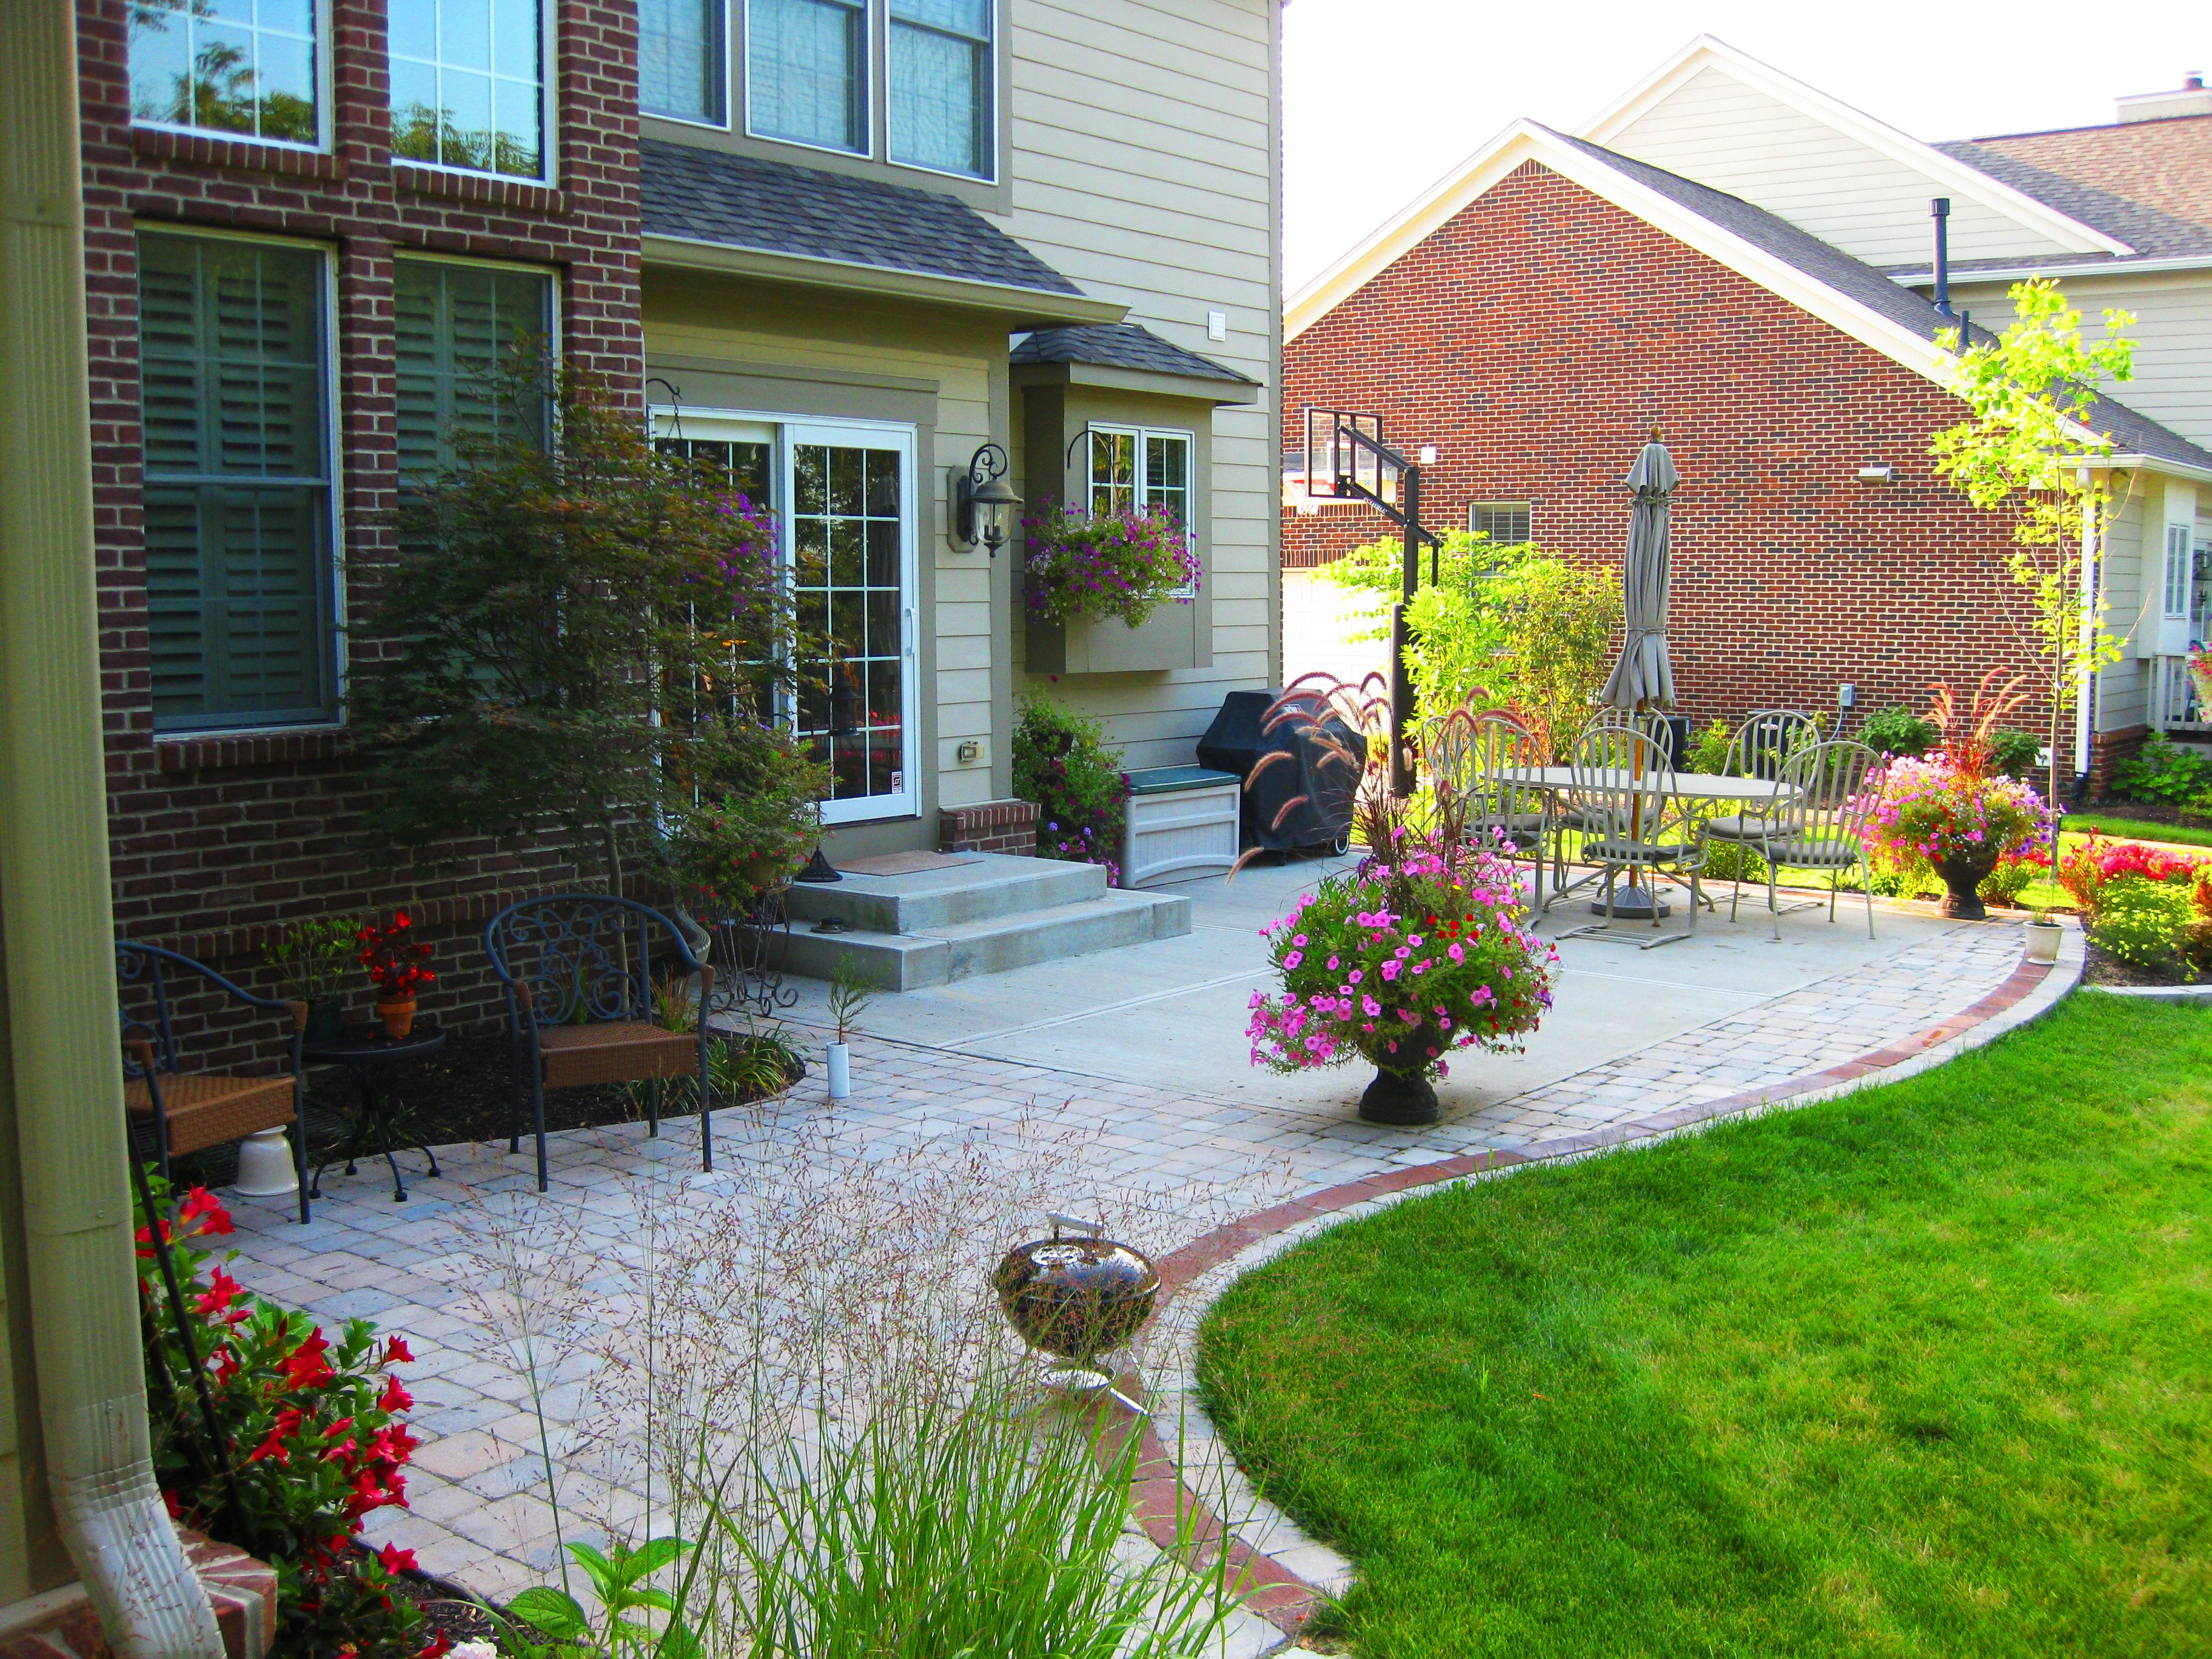 Extend Concrete Patio With Pavers, Backyard Concrete Patio ...